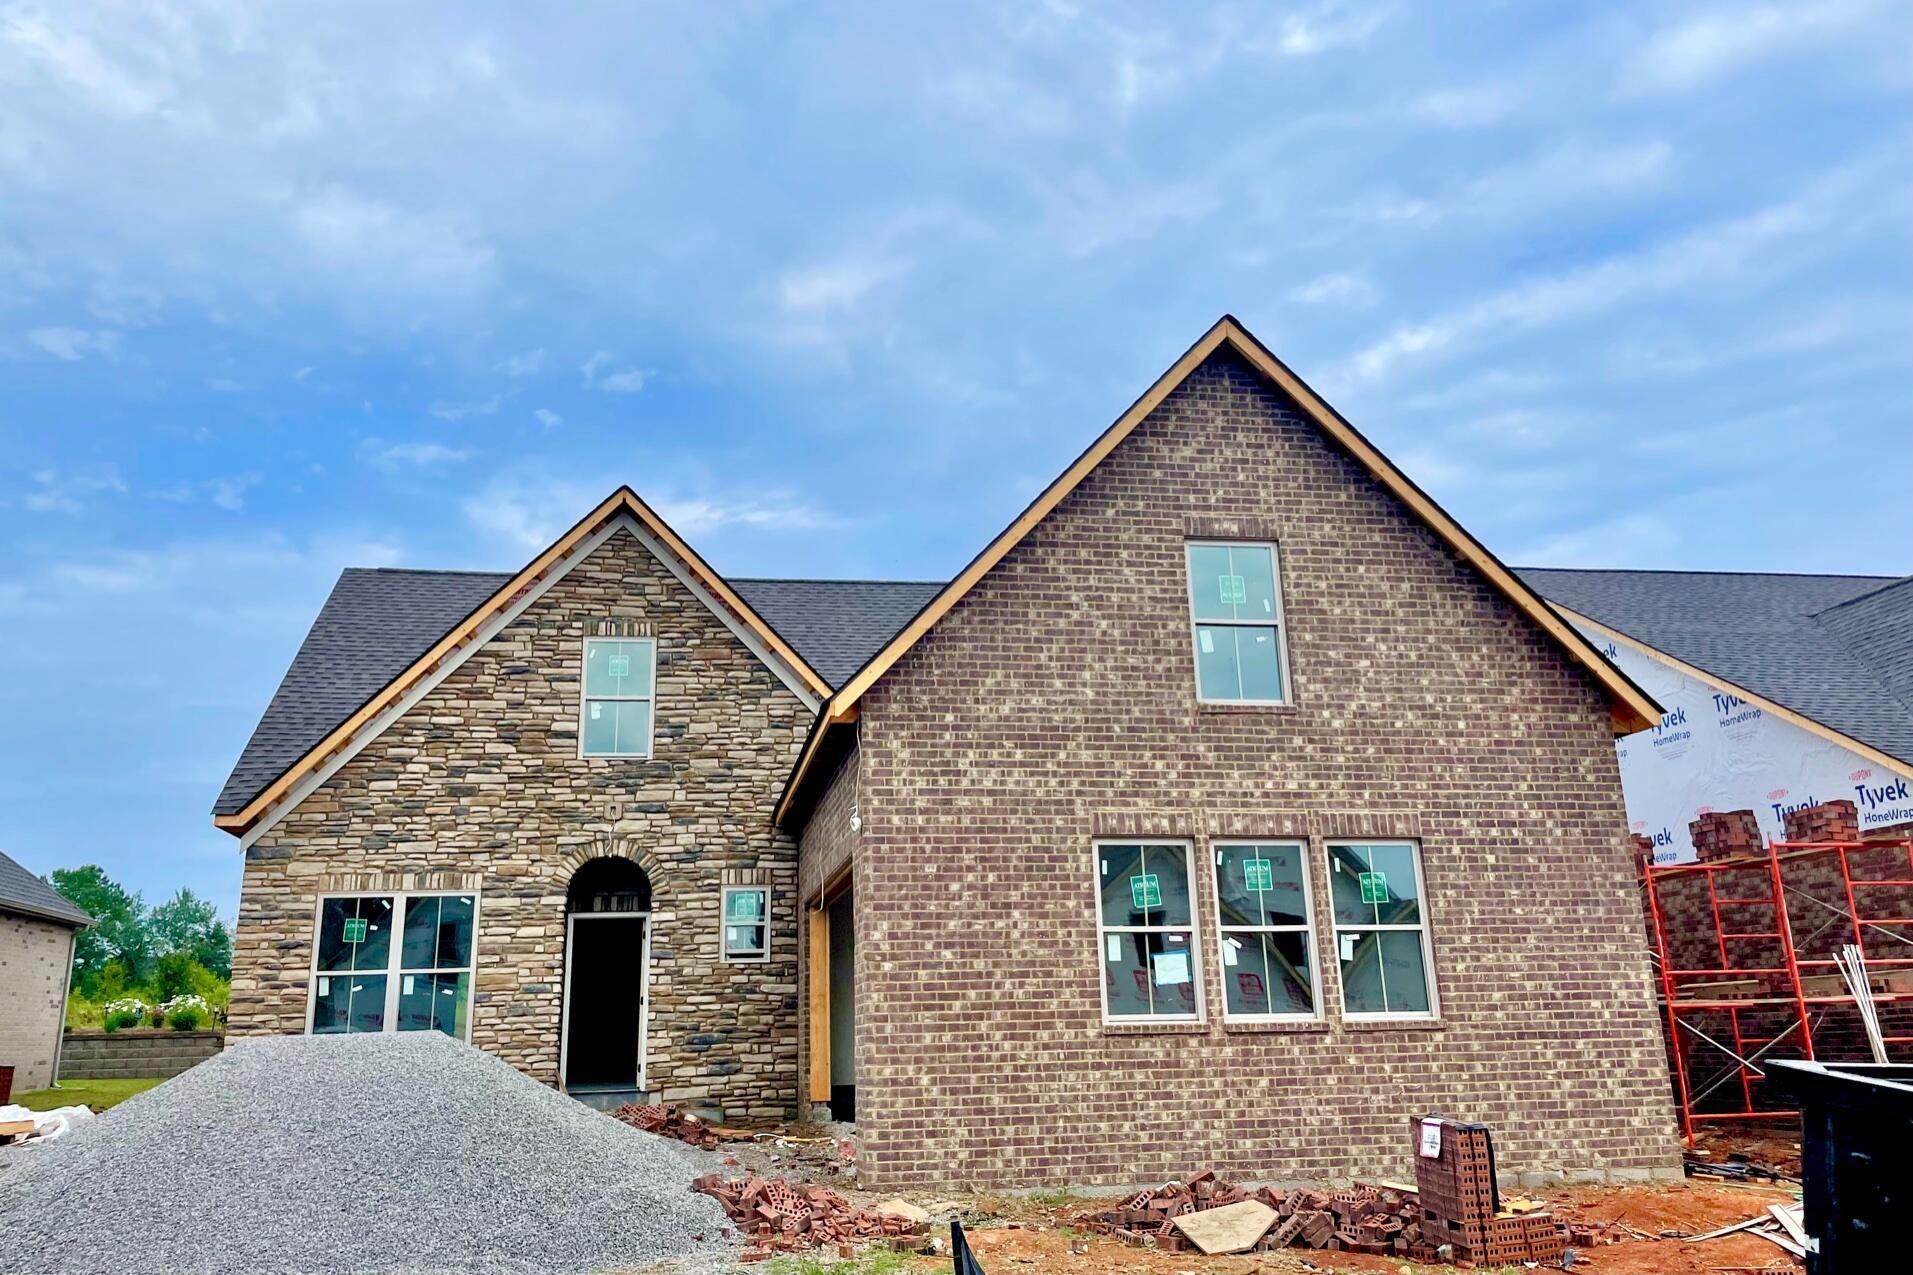 Photo of 136 Chimney Rock Drive, Lenoir City, TN 37771 (MLS # 1159442)